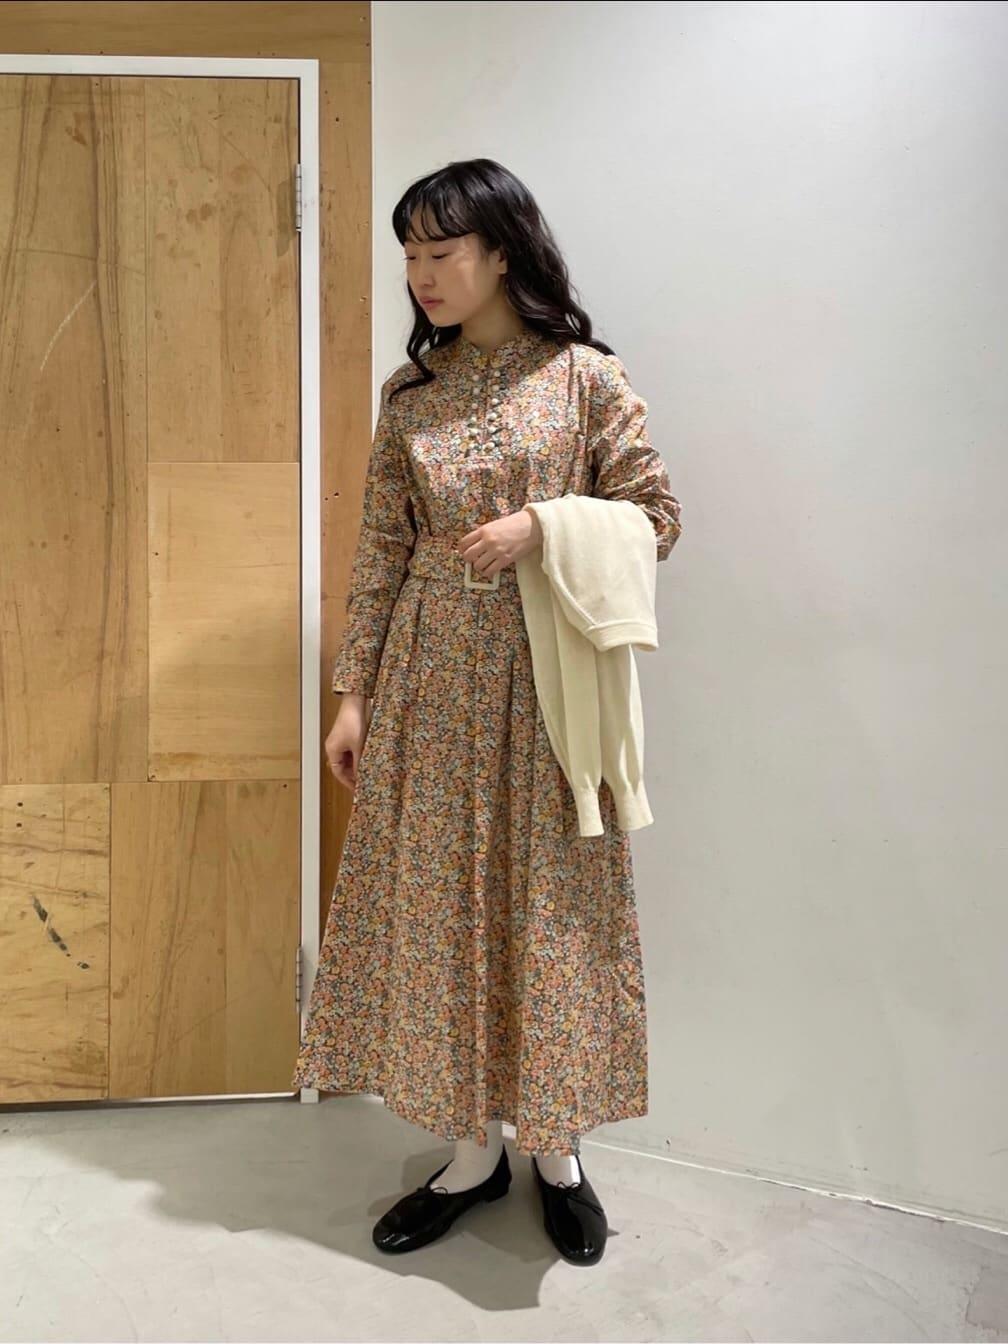 l'atelier du savon 新宿ミロード 身長:153cm 2021.08.27